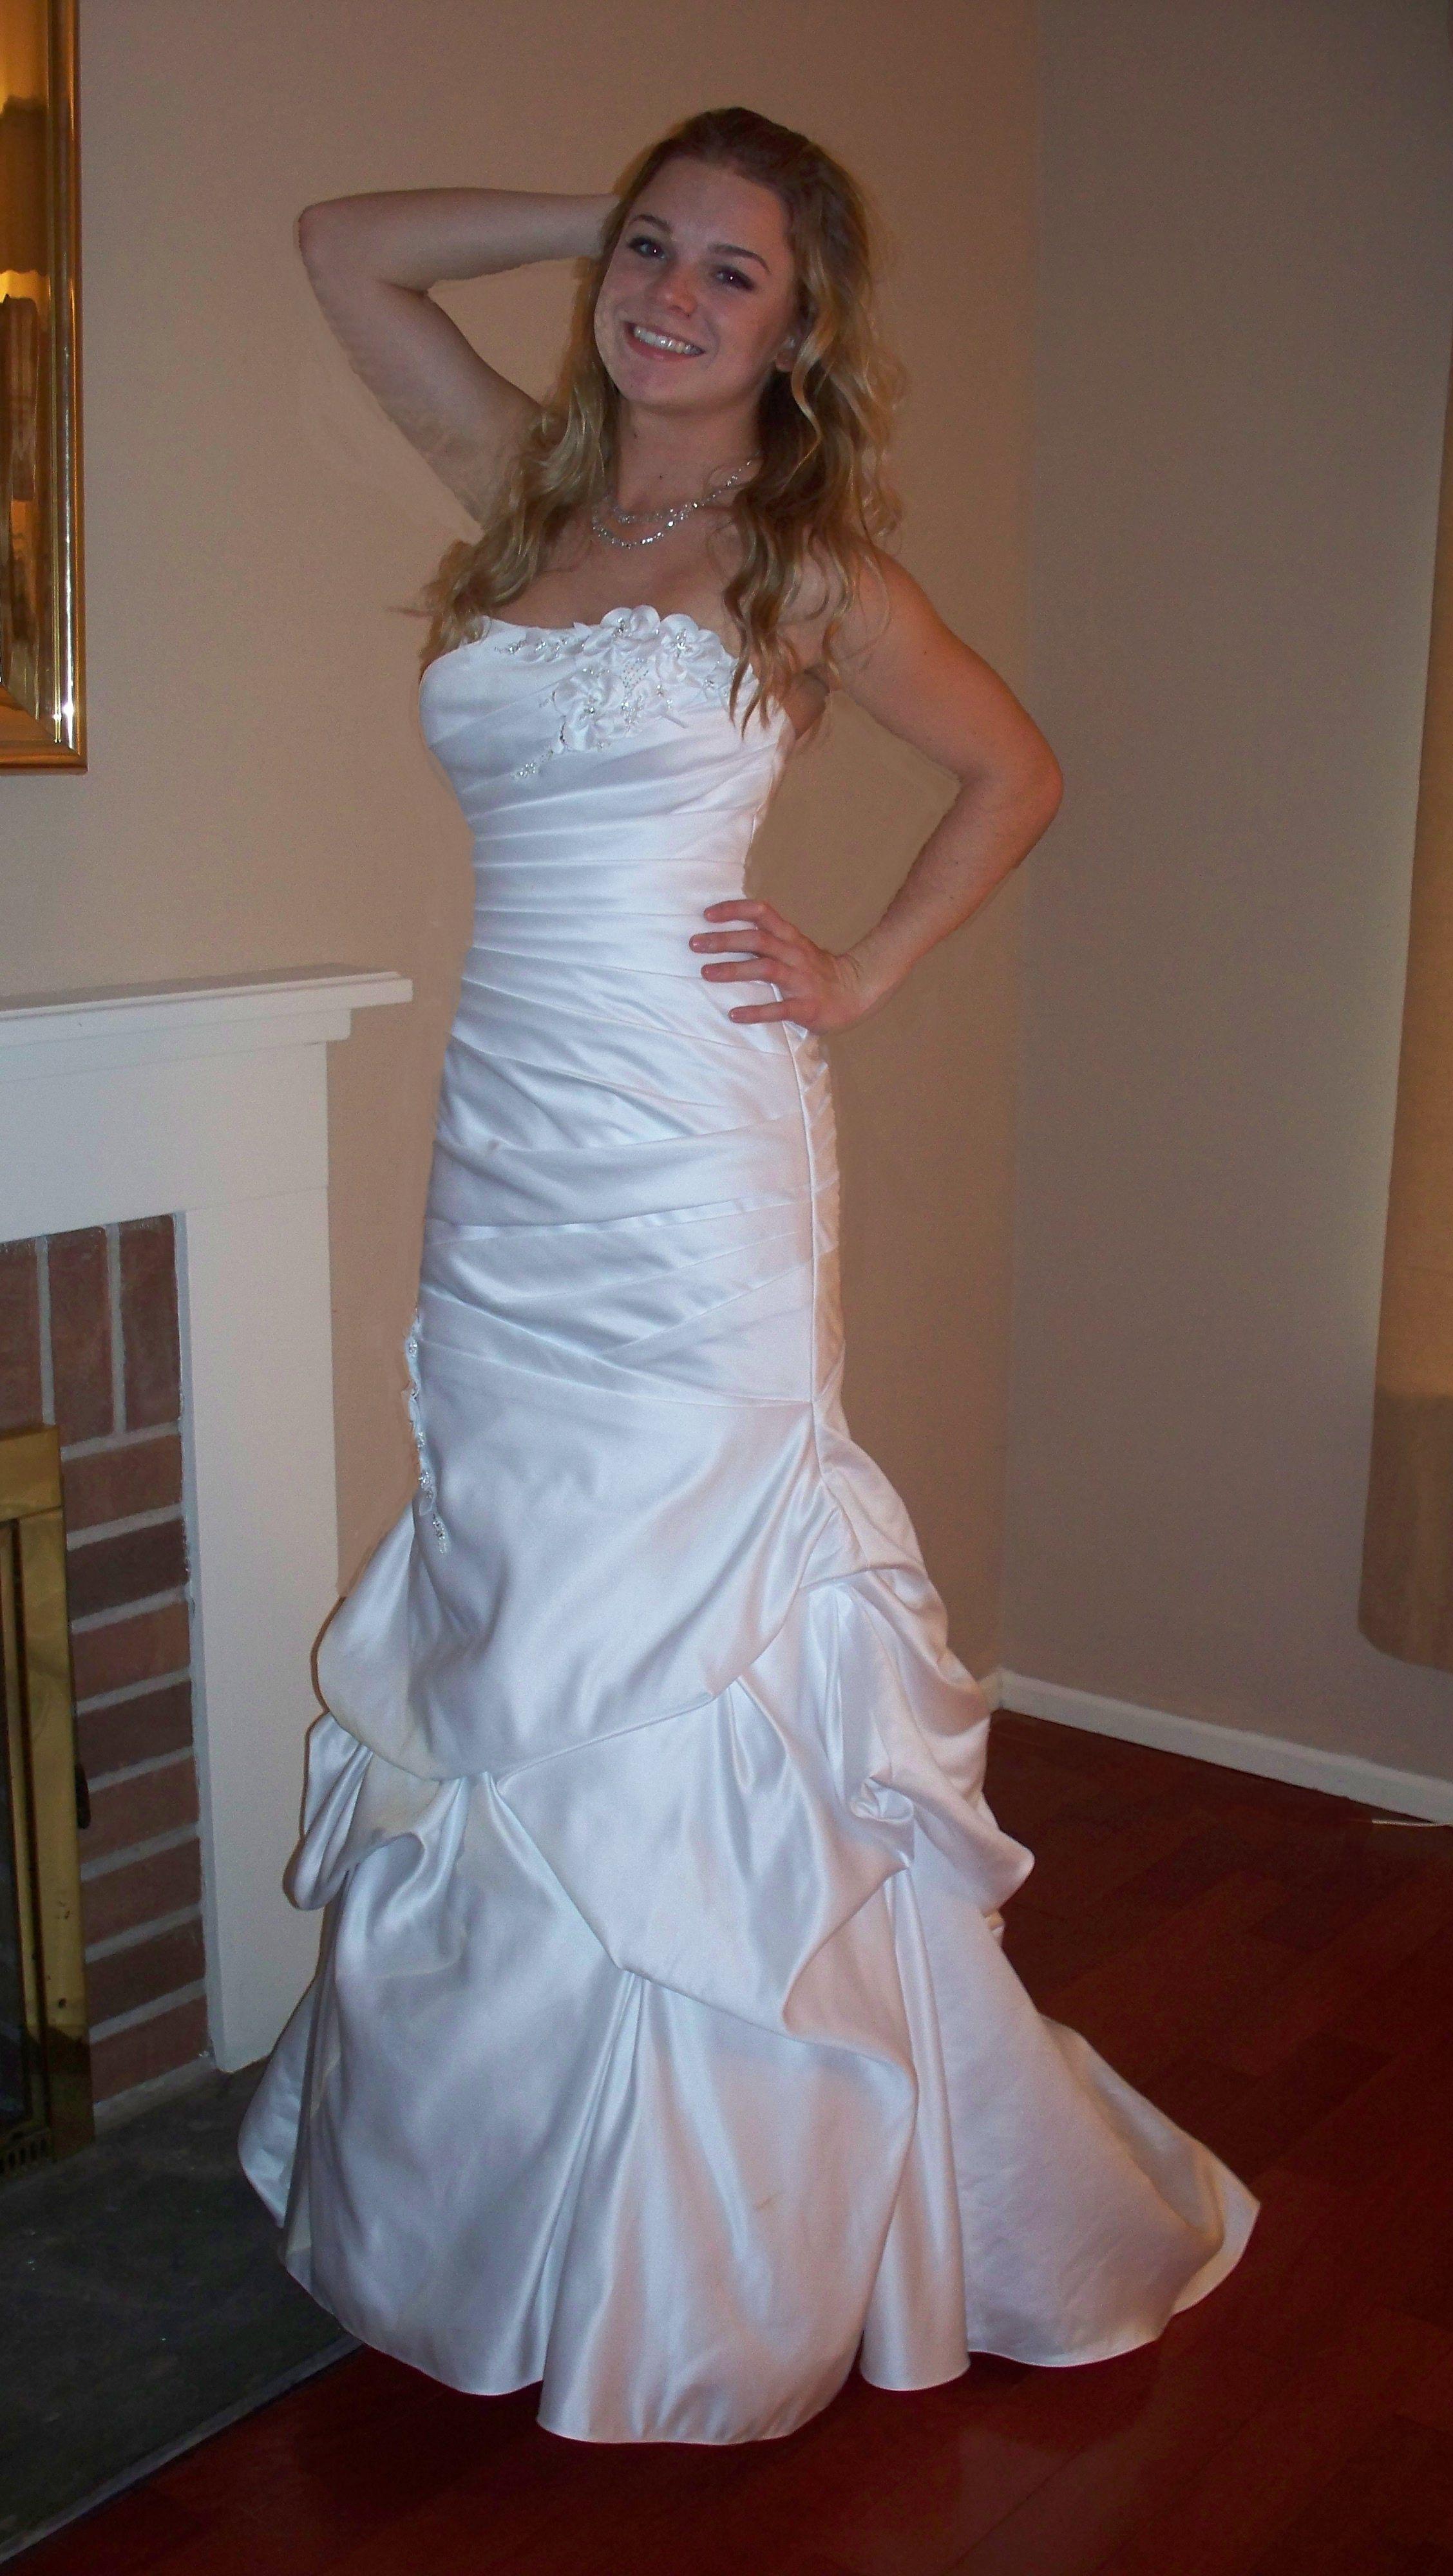 Recycled Wedding Dresses | Mori Lee Wedding Dress Mori Lee Wedding Dress On Tradesy Weddings